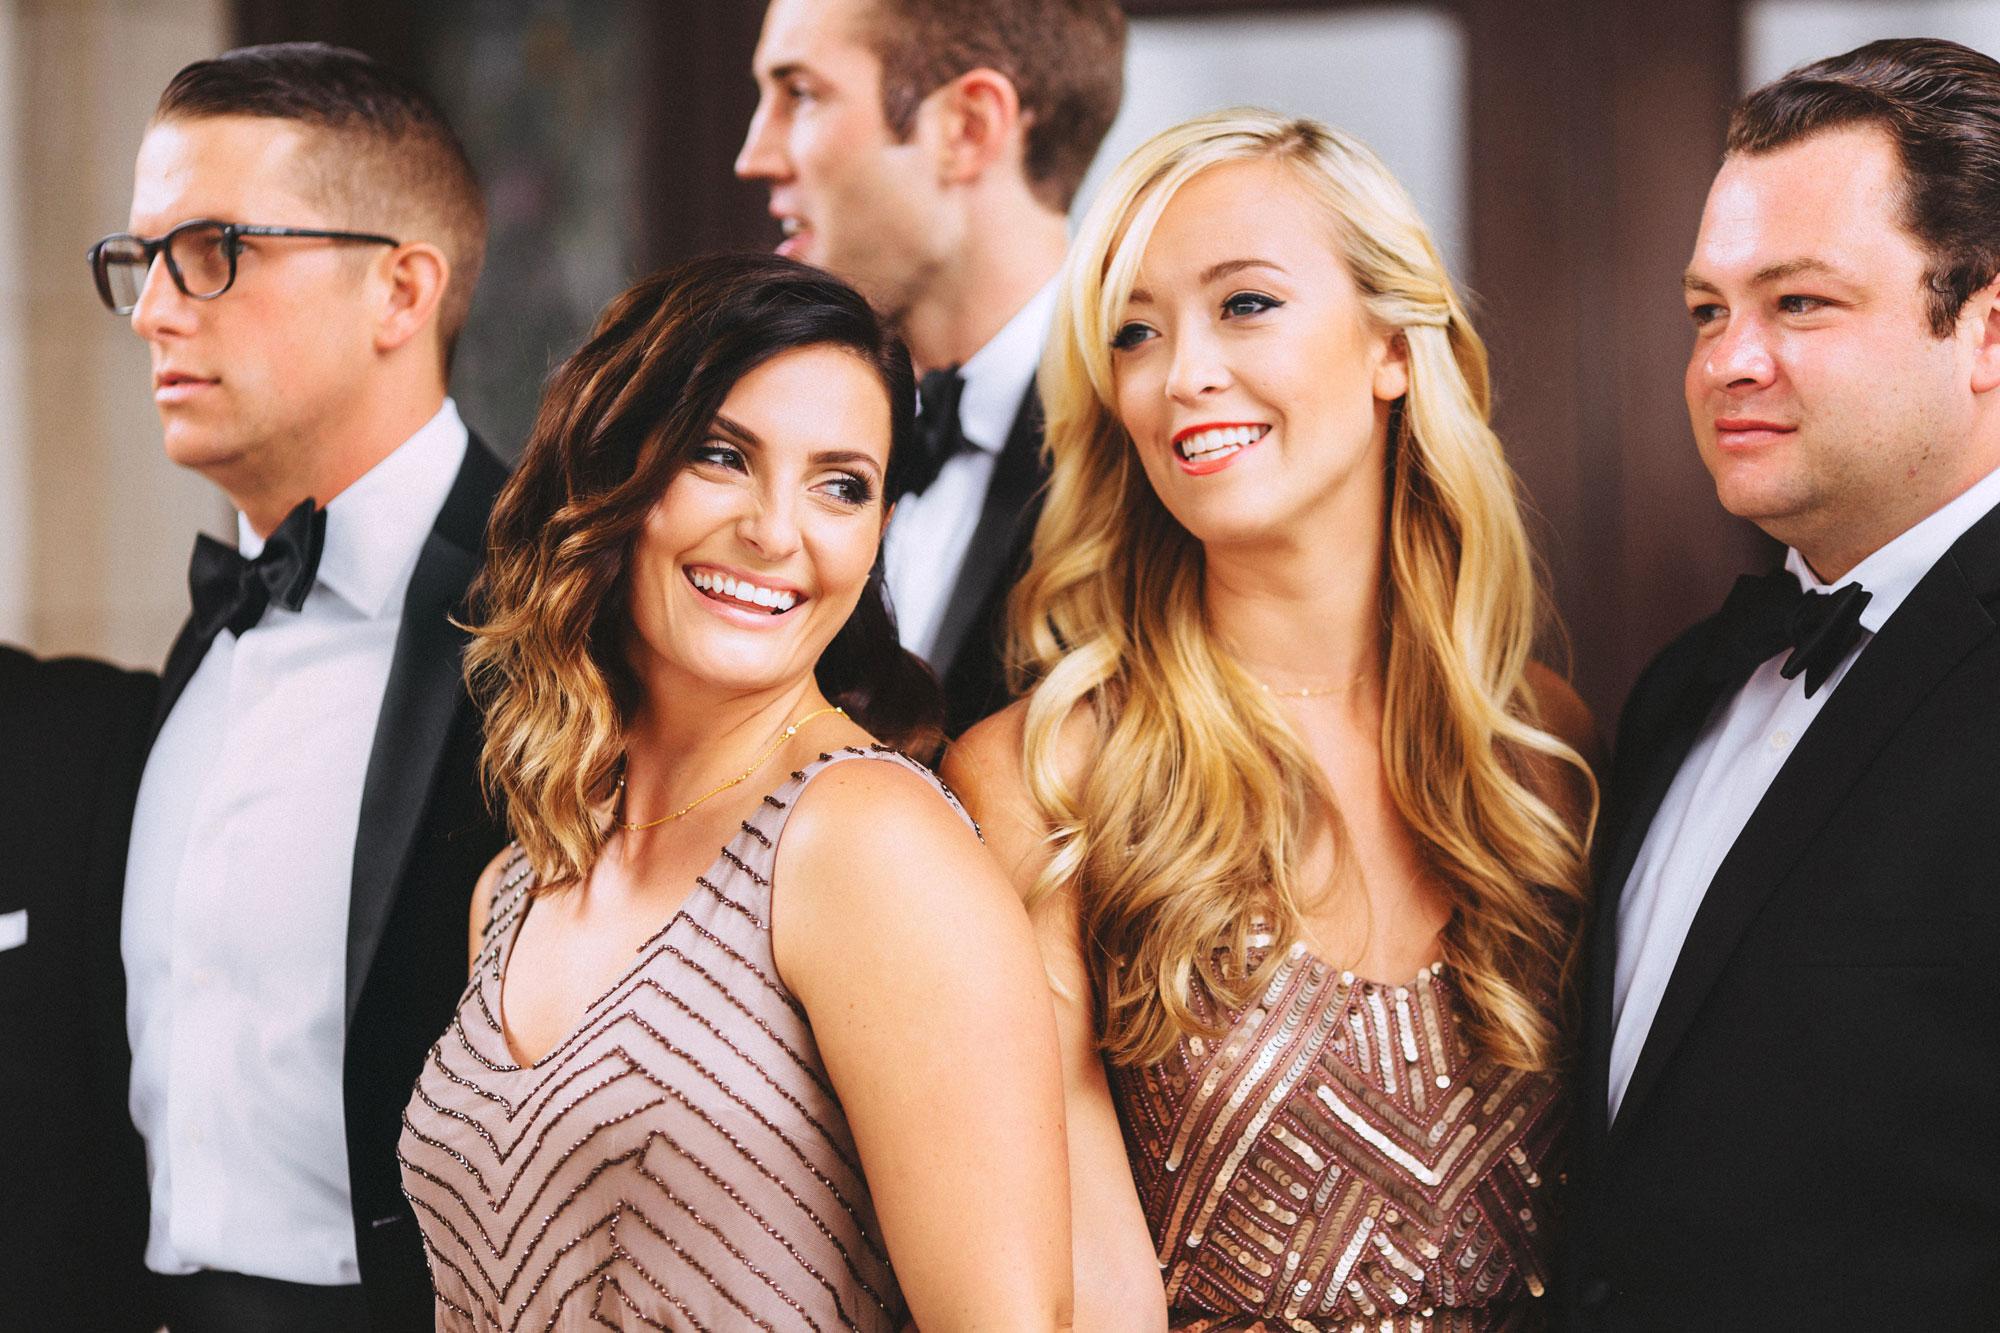 Me & Mr. Jones Wedding, Adrianna Papell Beaded Blouson Gown, Beaded Bridesmaids Dresses, Black Tie Wedding, Nashville Wedding